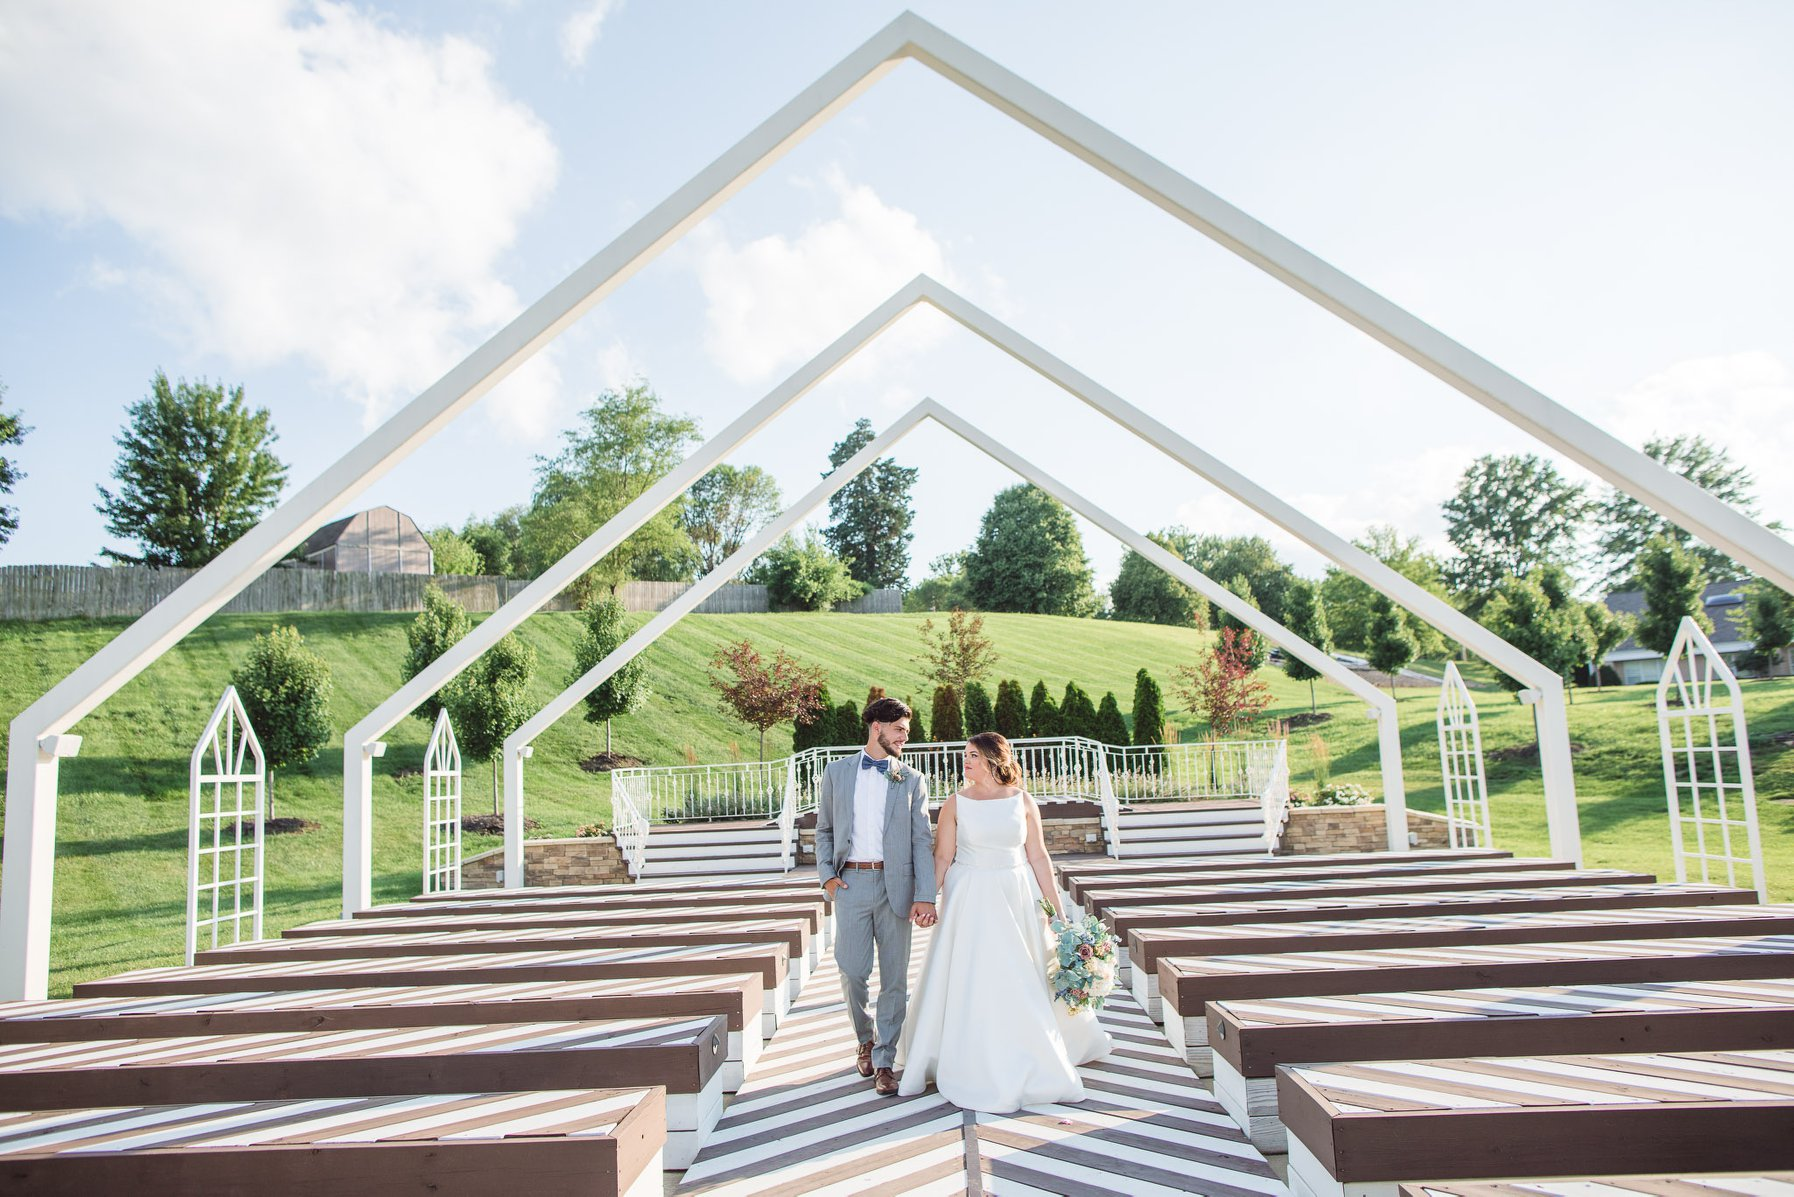 The Pavilion Event Space| eGolden Moments